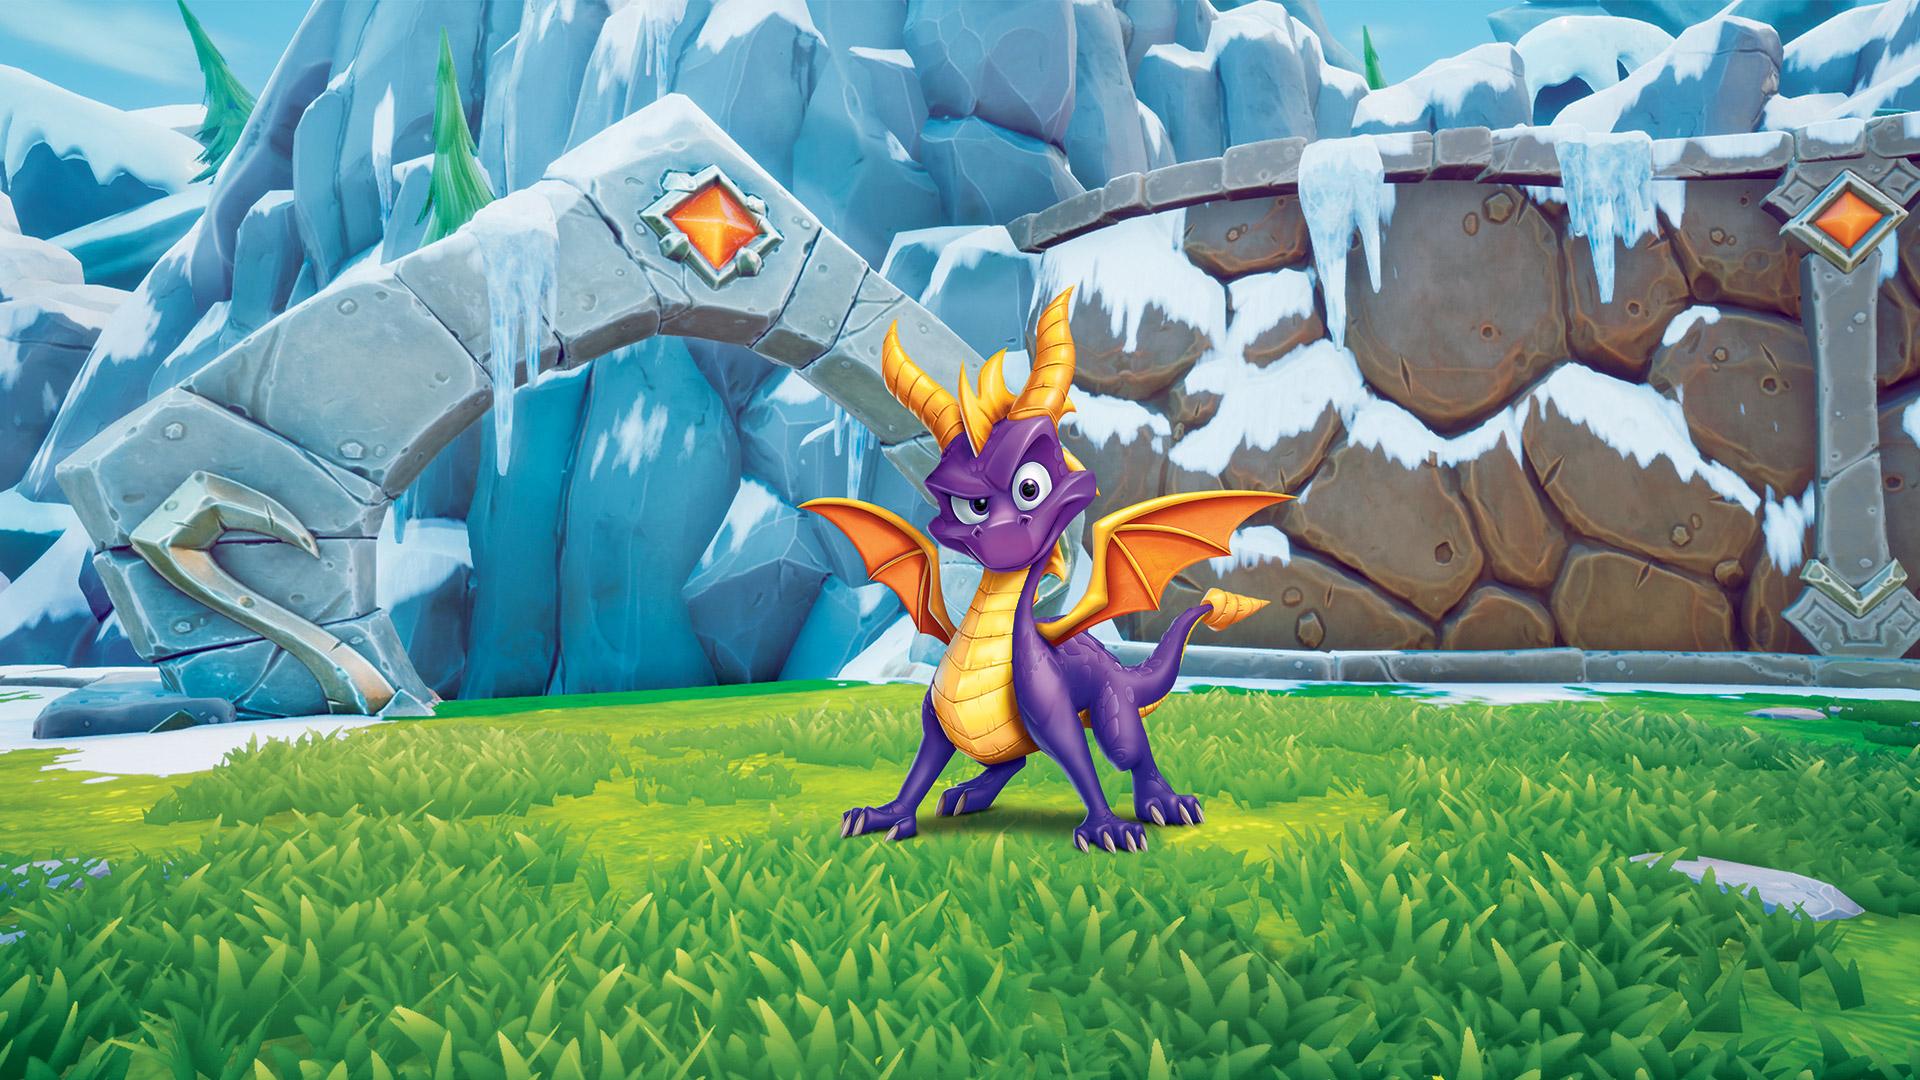 Free Spyro the Dragon Wallpaper in 1920x1080